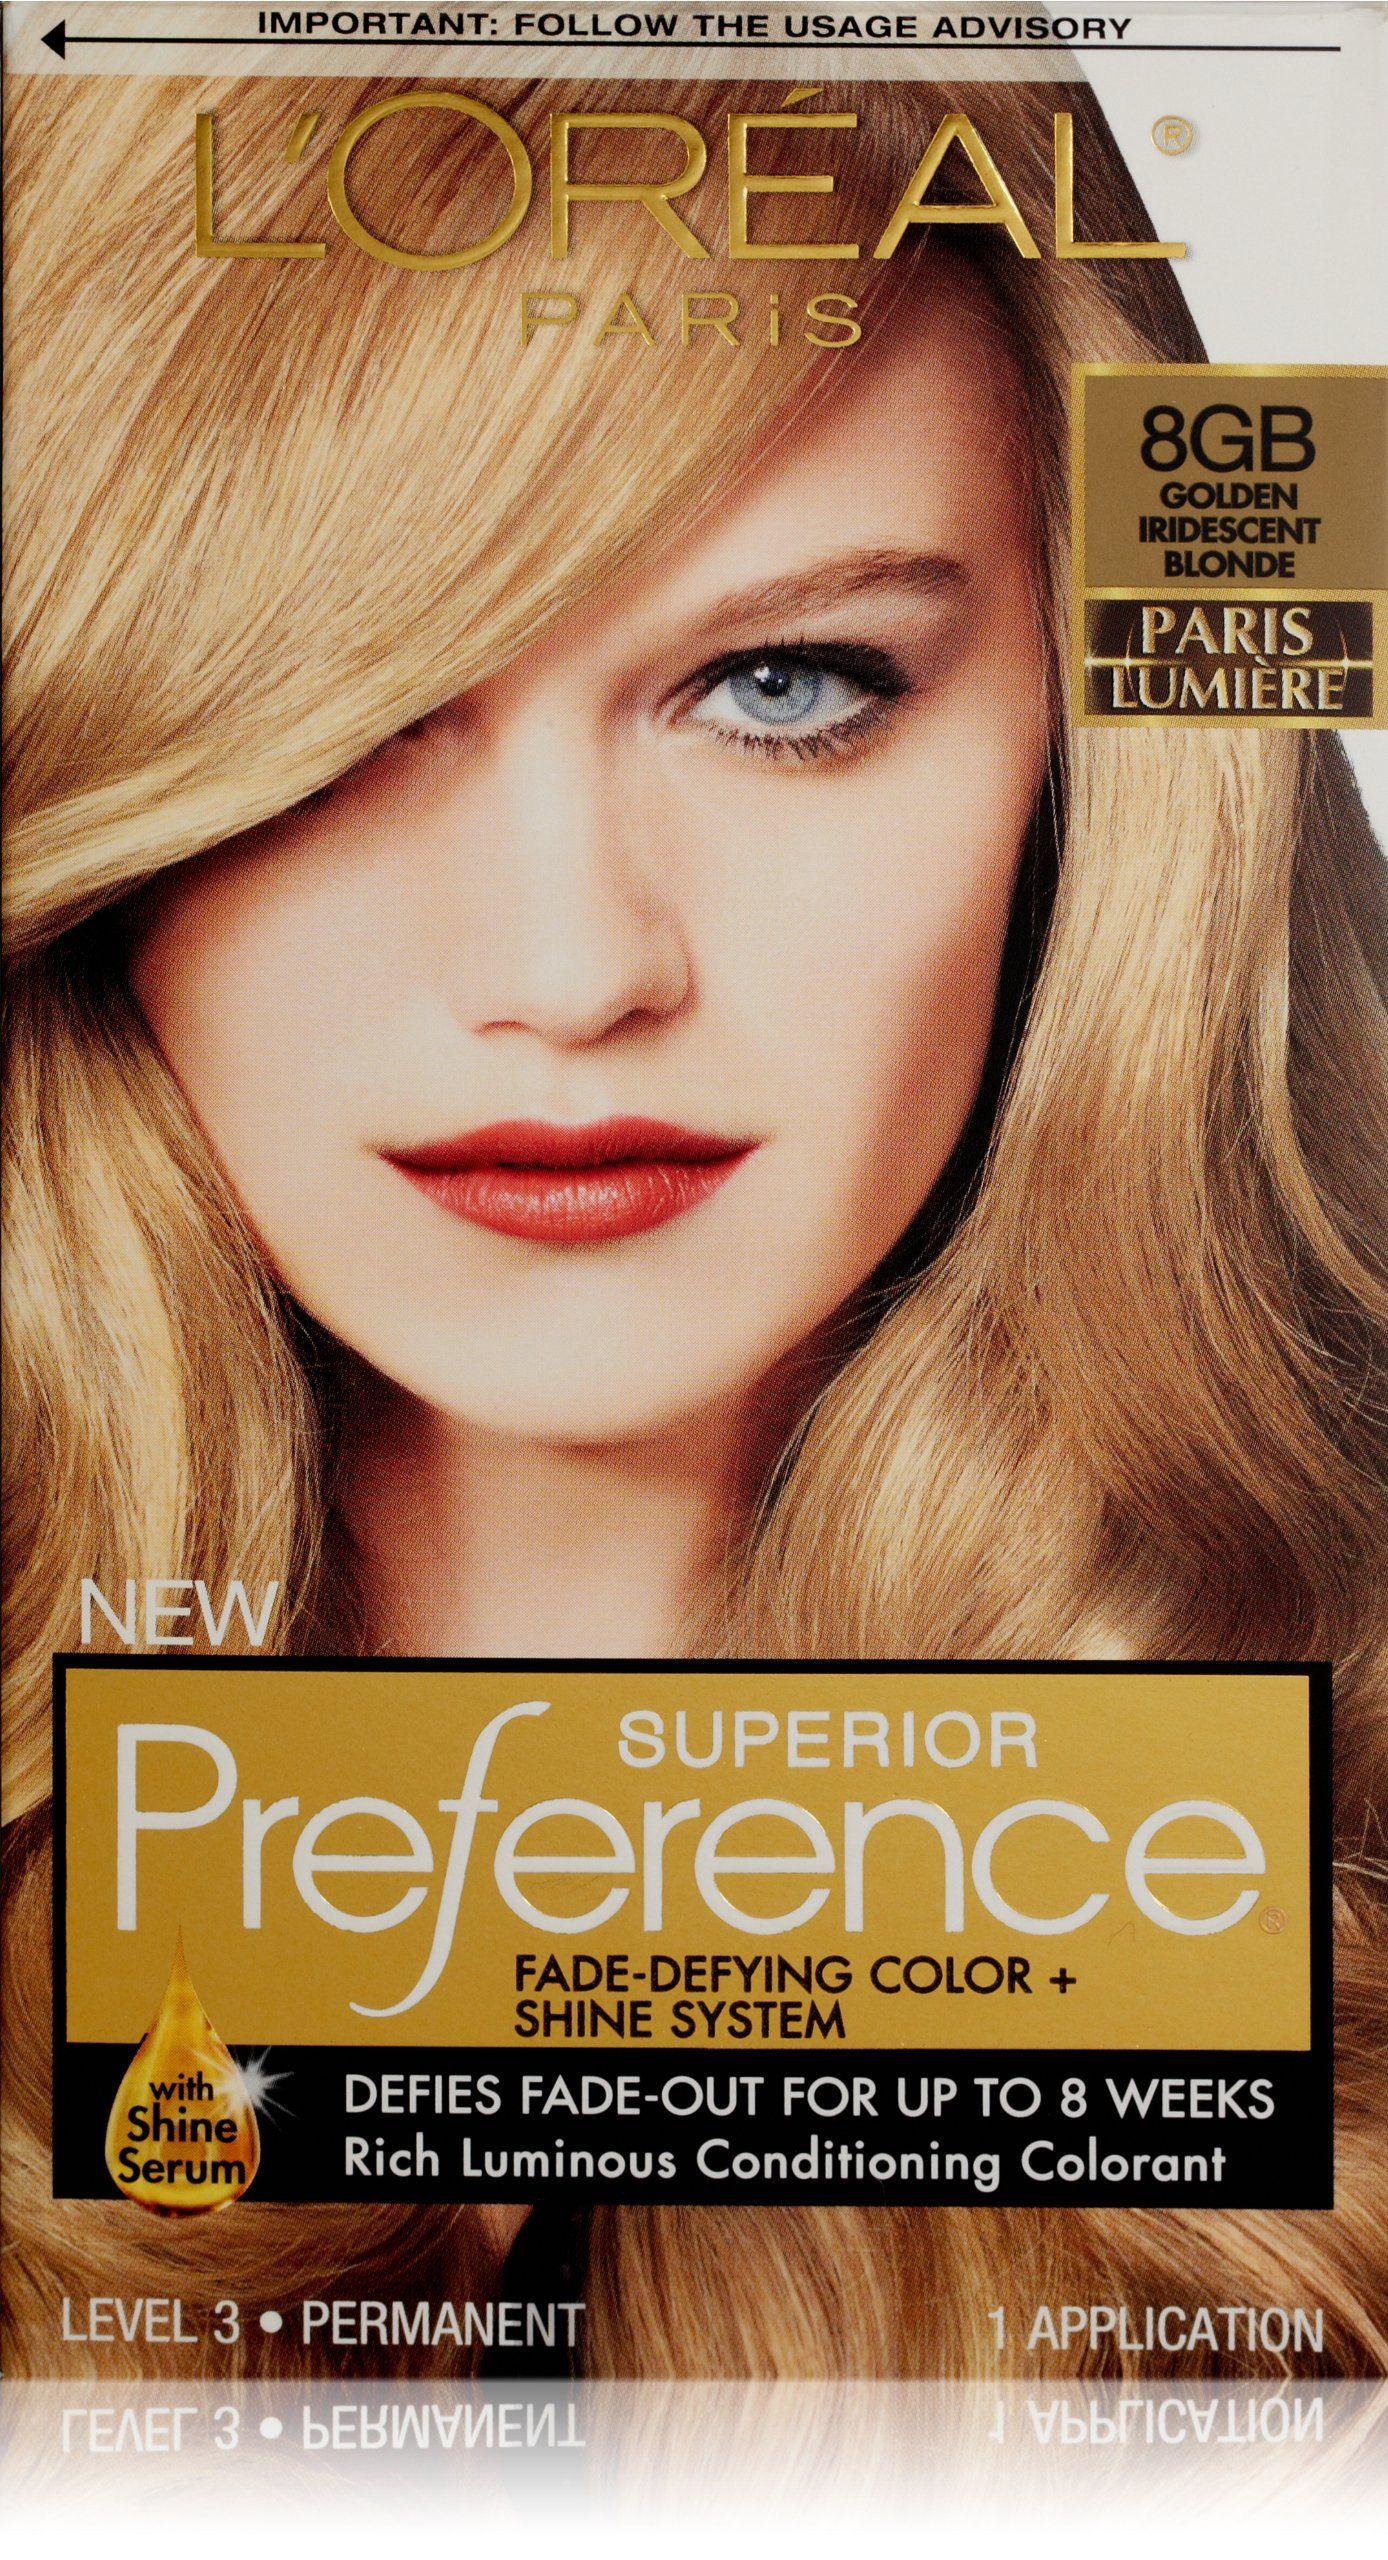 L Oreal Paris Superior Preference Hair Color 8gb Golden Iridescent Blonde The Paris Lumiere Collection By Superior Prefer Hair Color Hair Color Shades Loreal